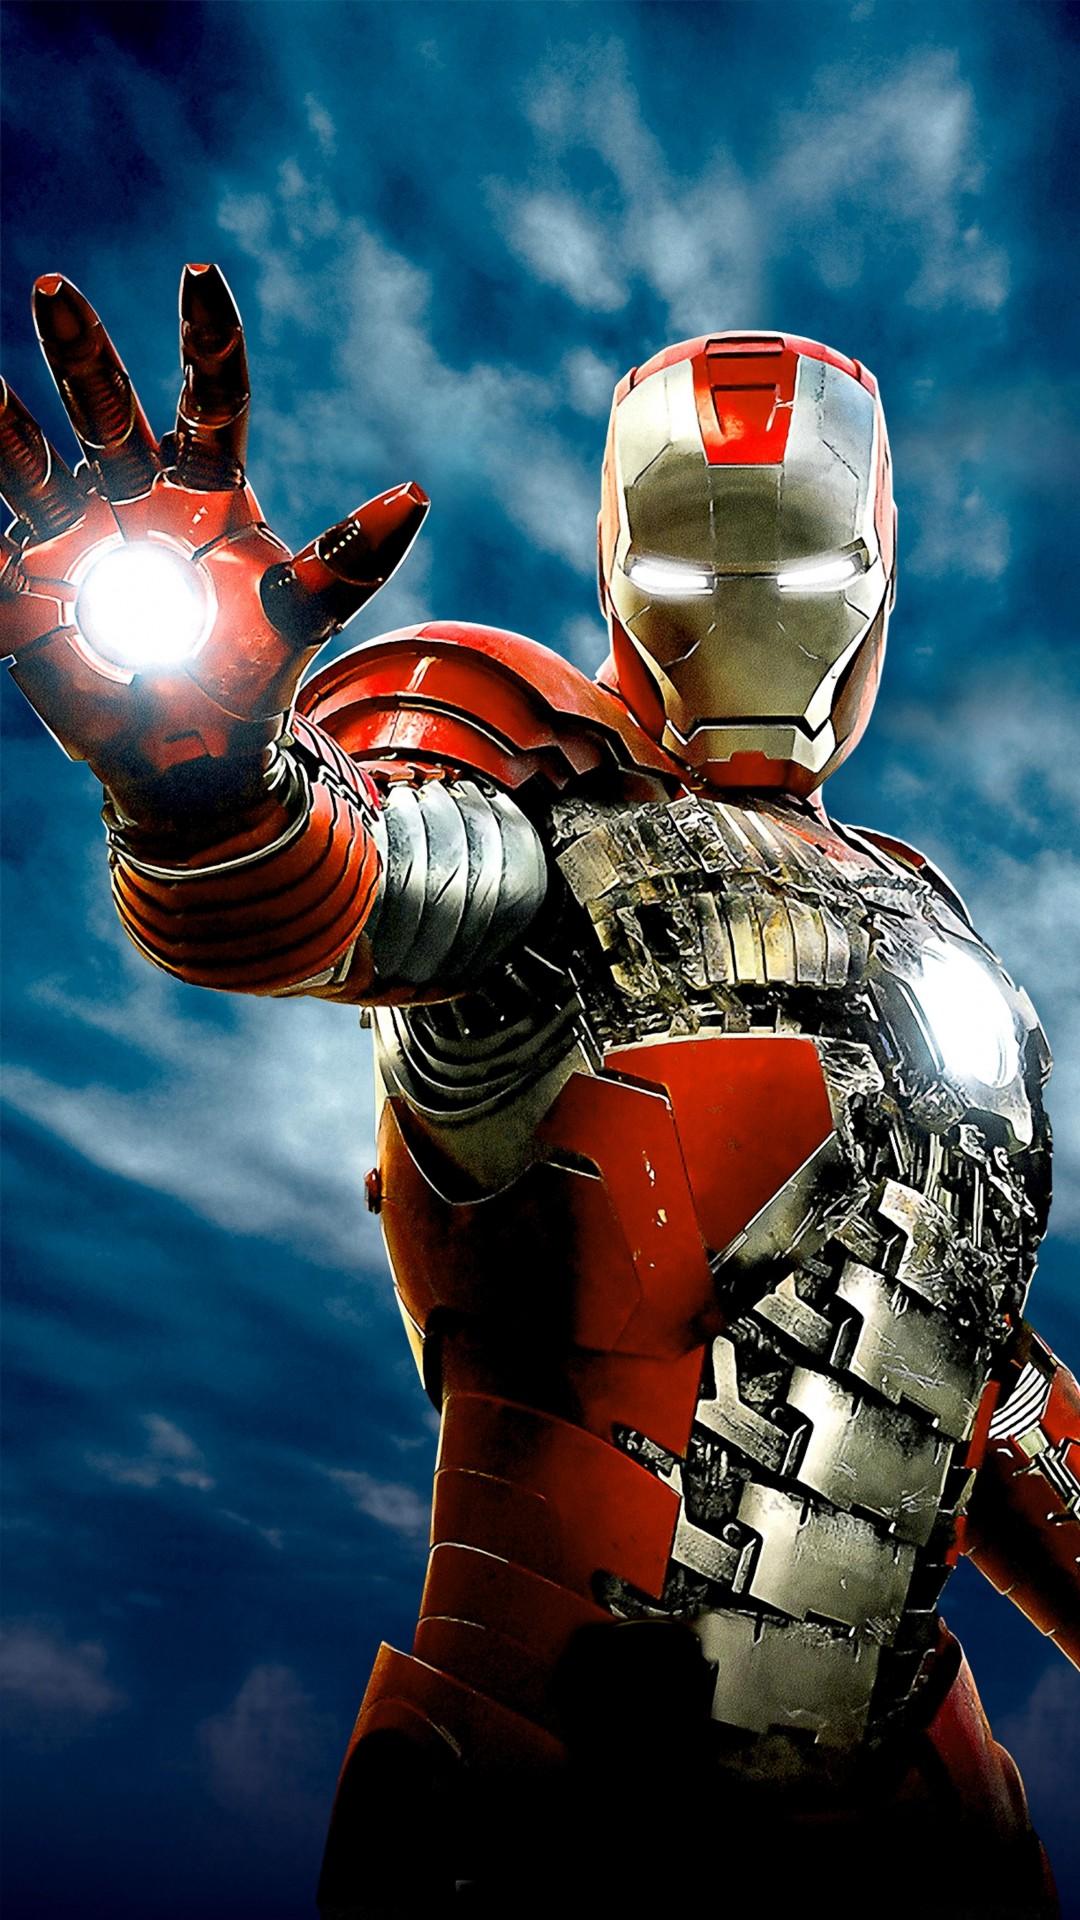 10 Hd Iron Man Iphone 6 Wallpapers Iron Man Hd Wallpaper